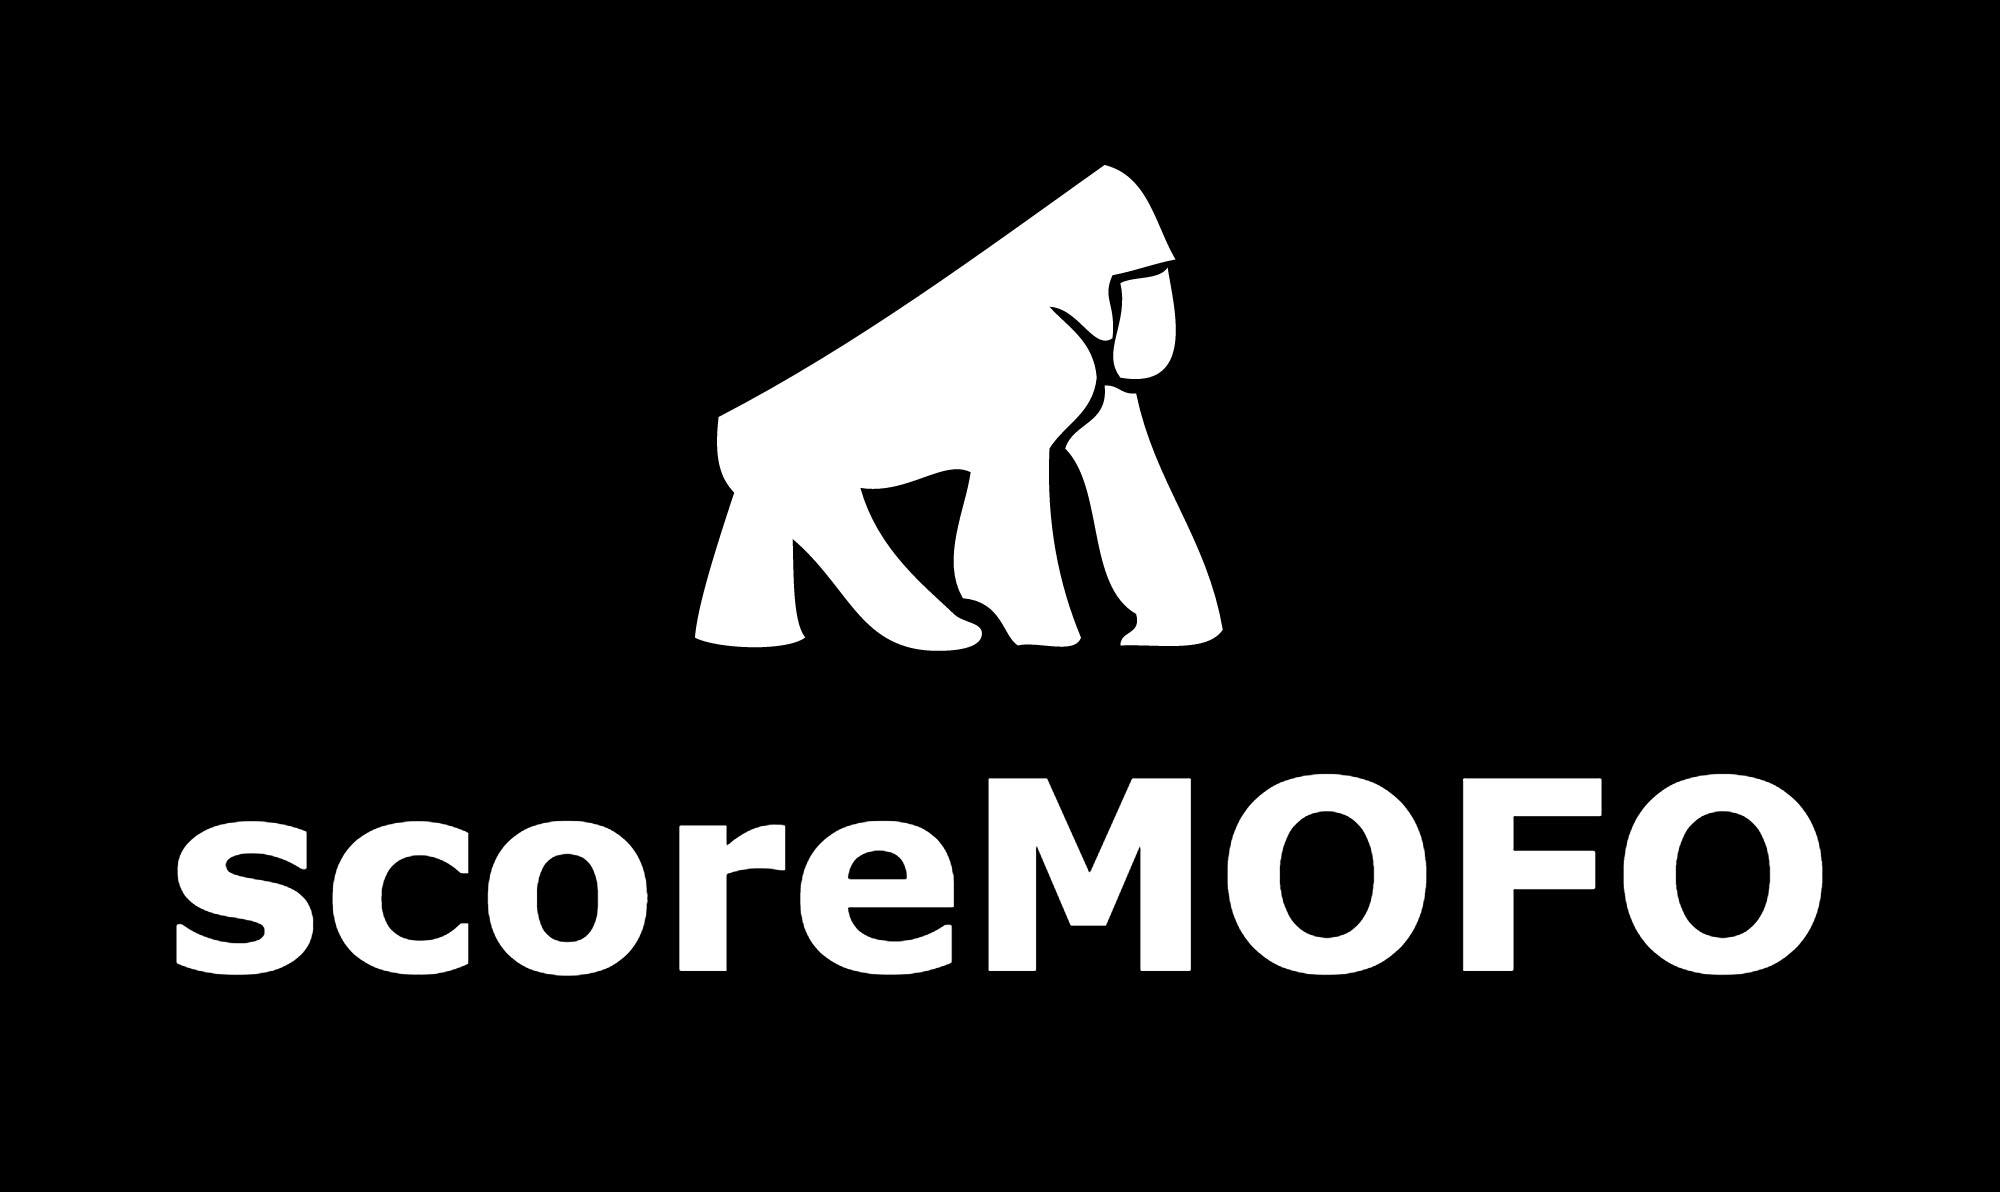 scoremofo.jpg